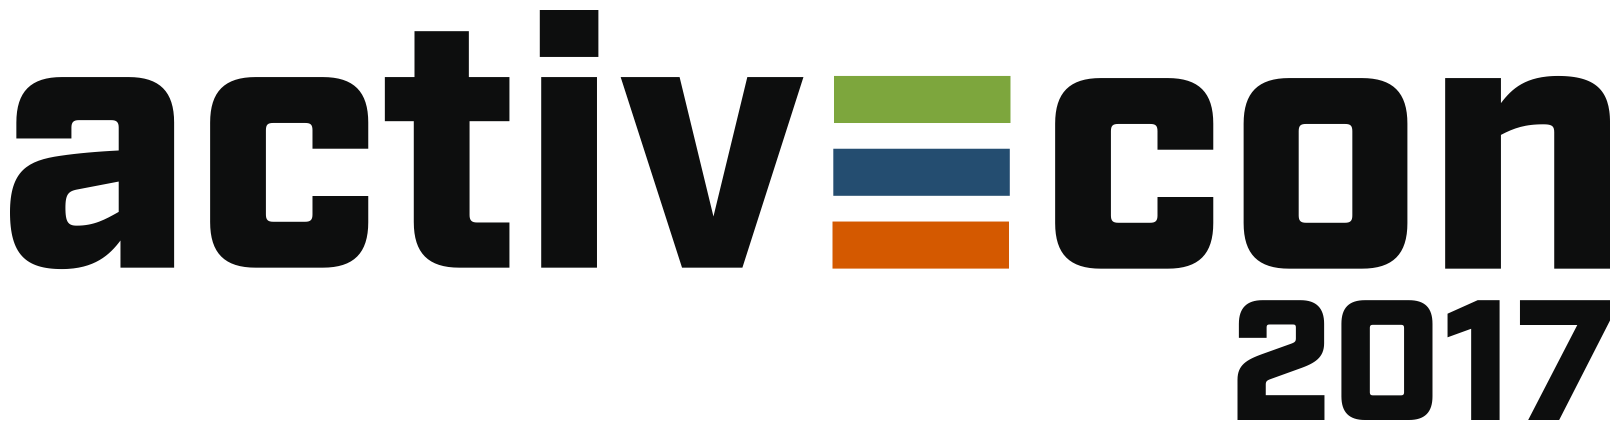 activcon 2017 logo